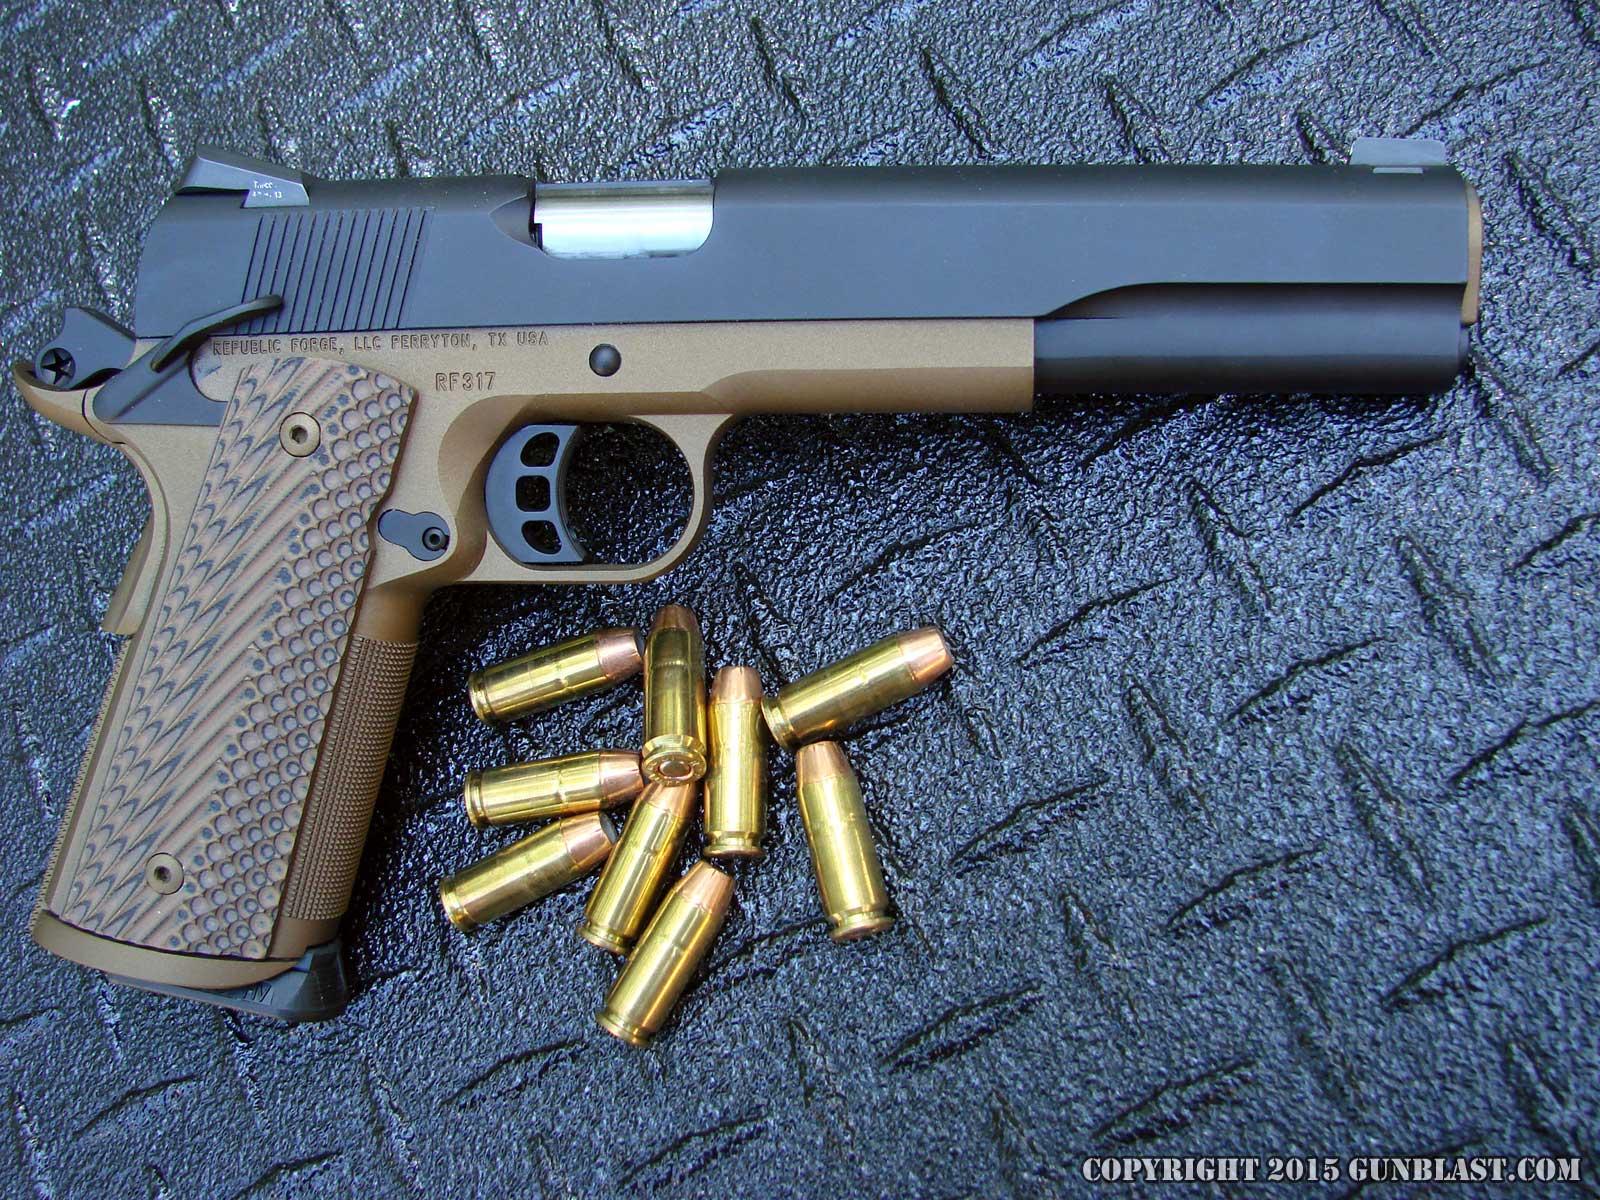 Republic Forge Custom Longslide 10mm 1911 Semi-Automatic Pistol